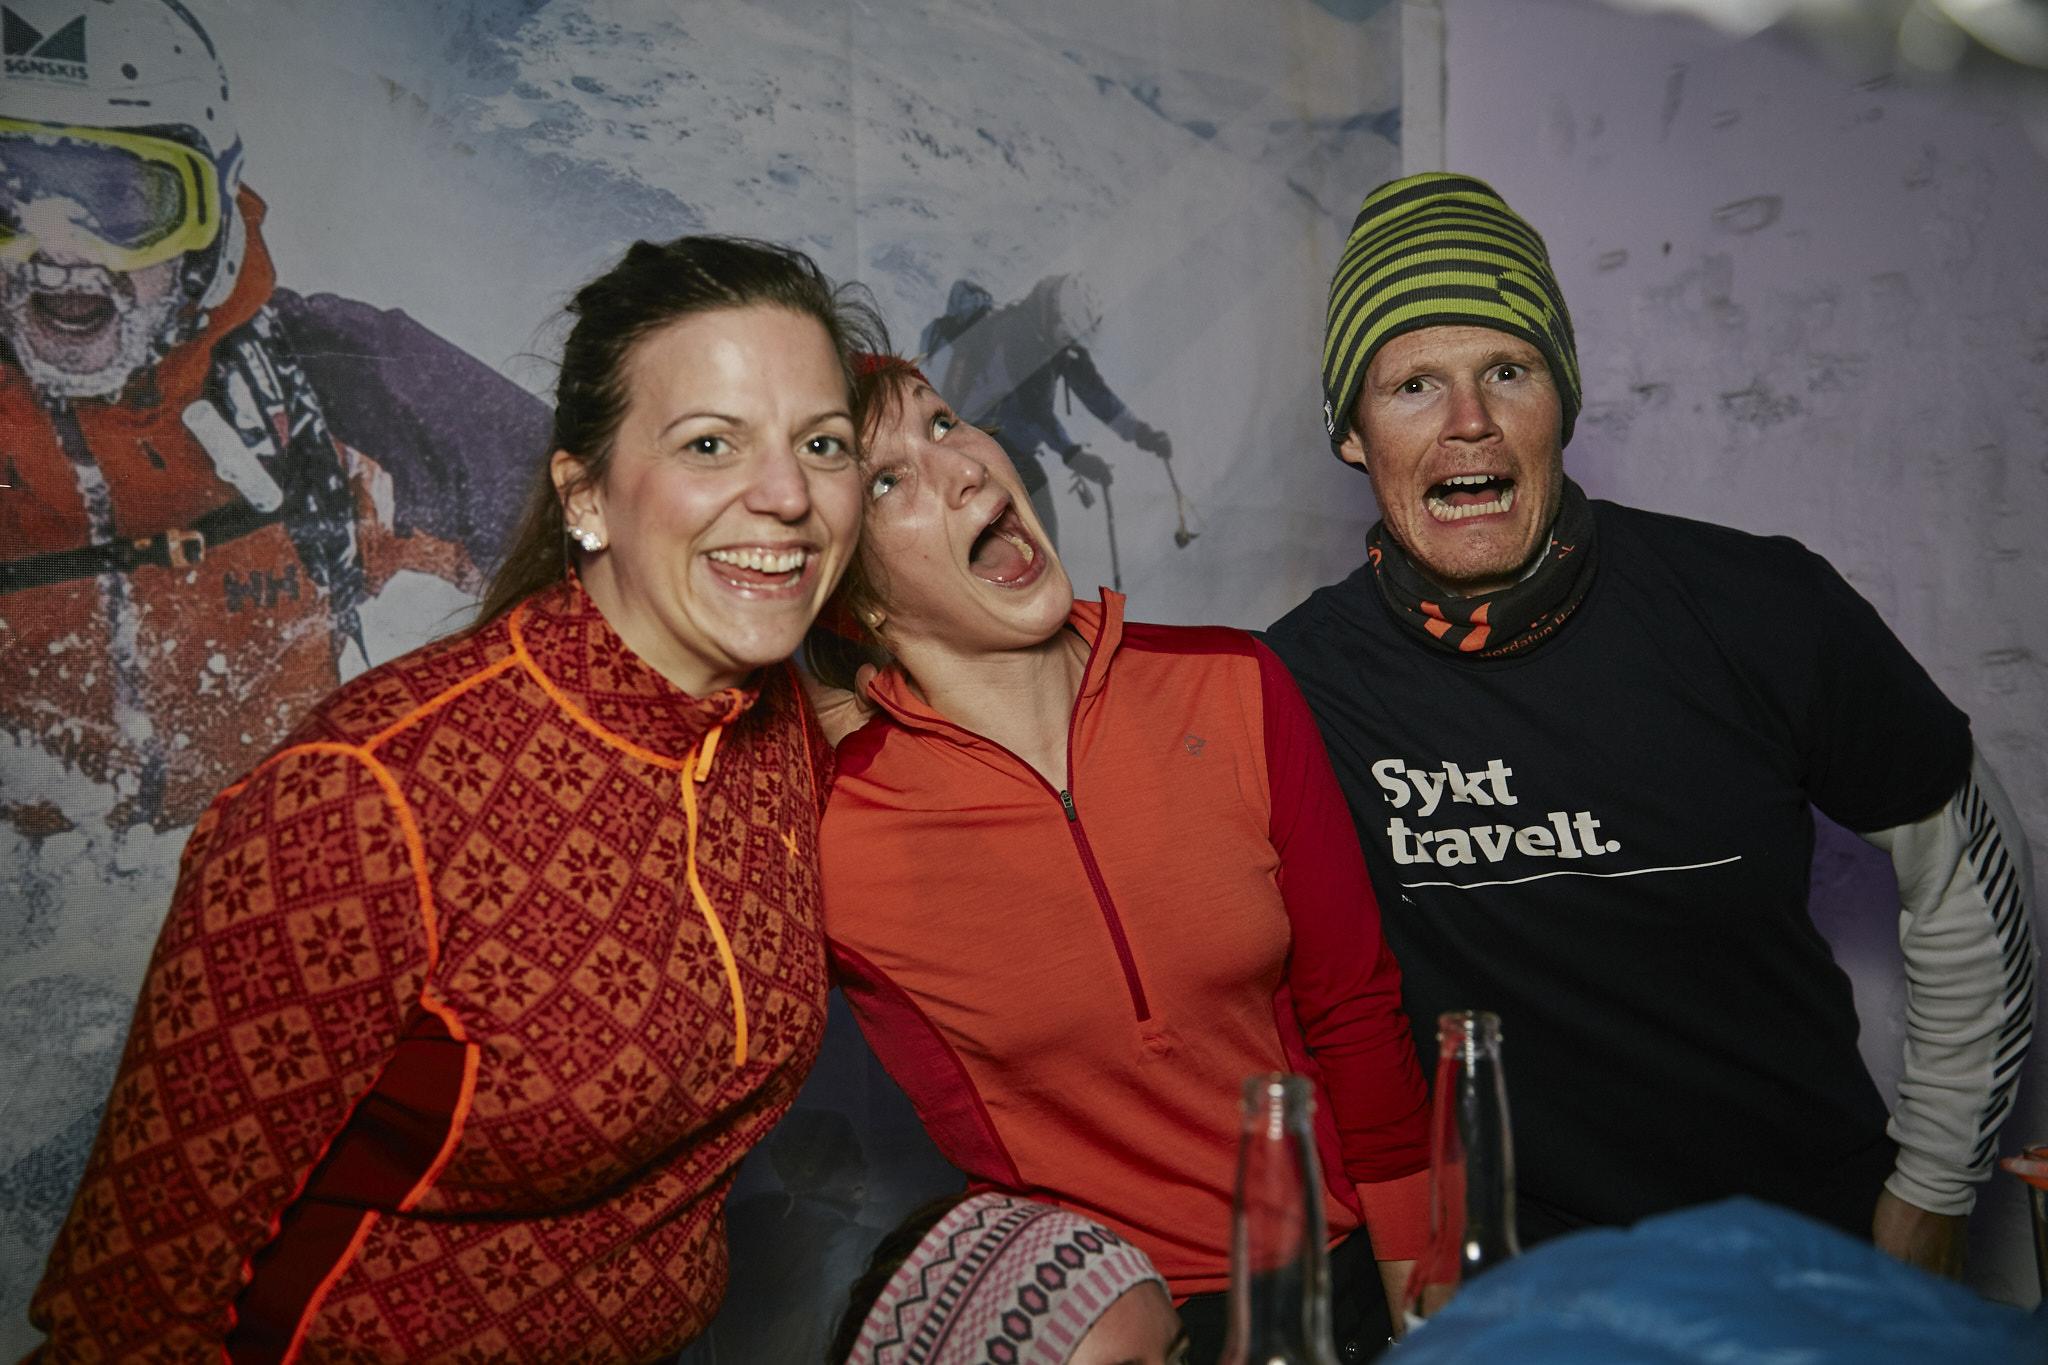 2018.02.22-Fjellsportfestival-Afterski-007.jpg